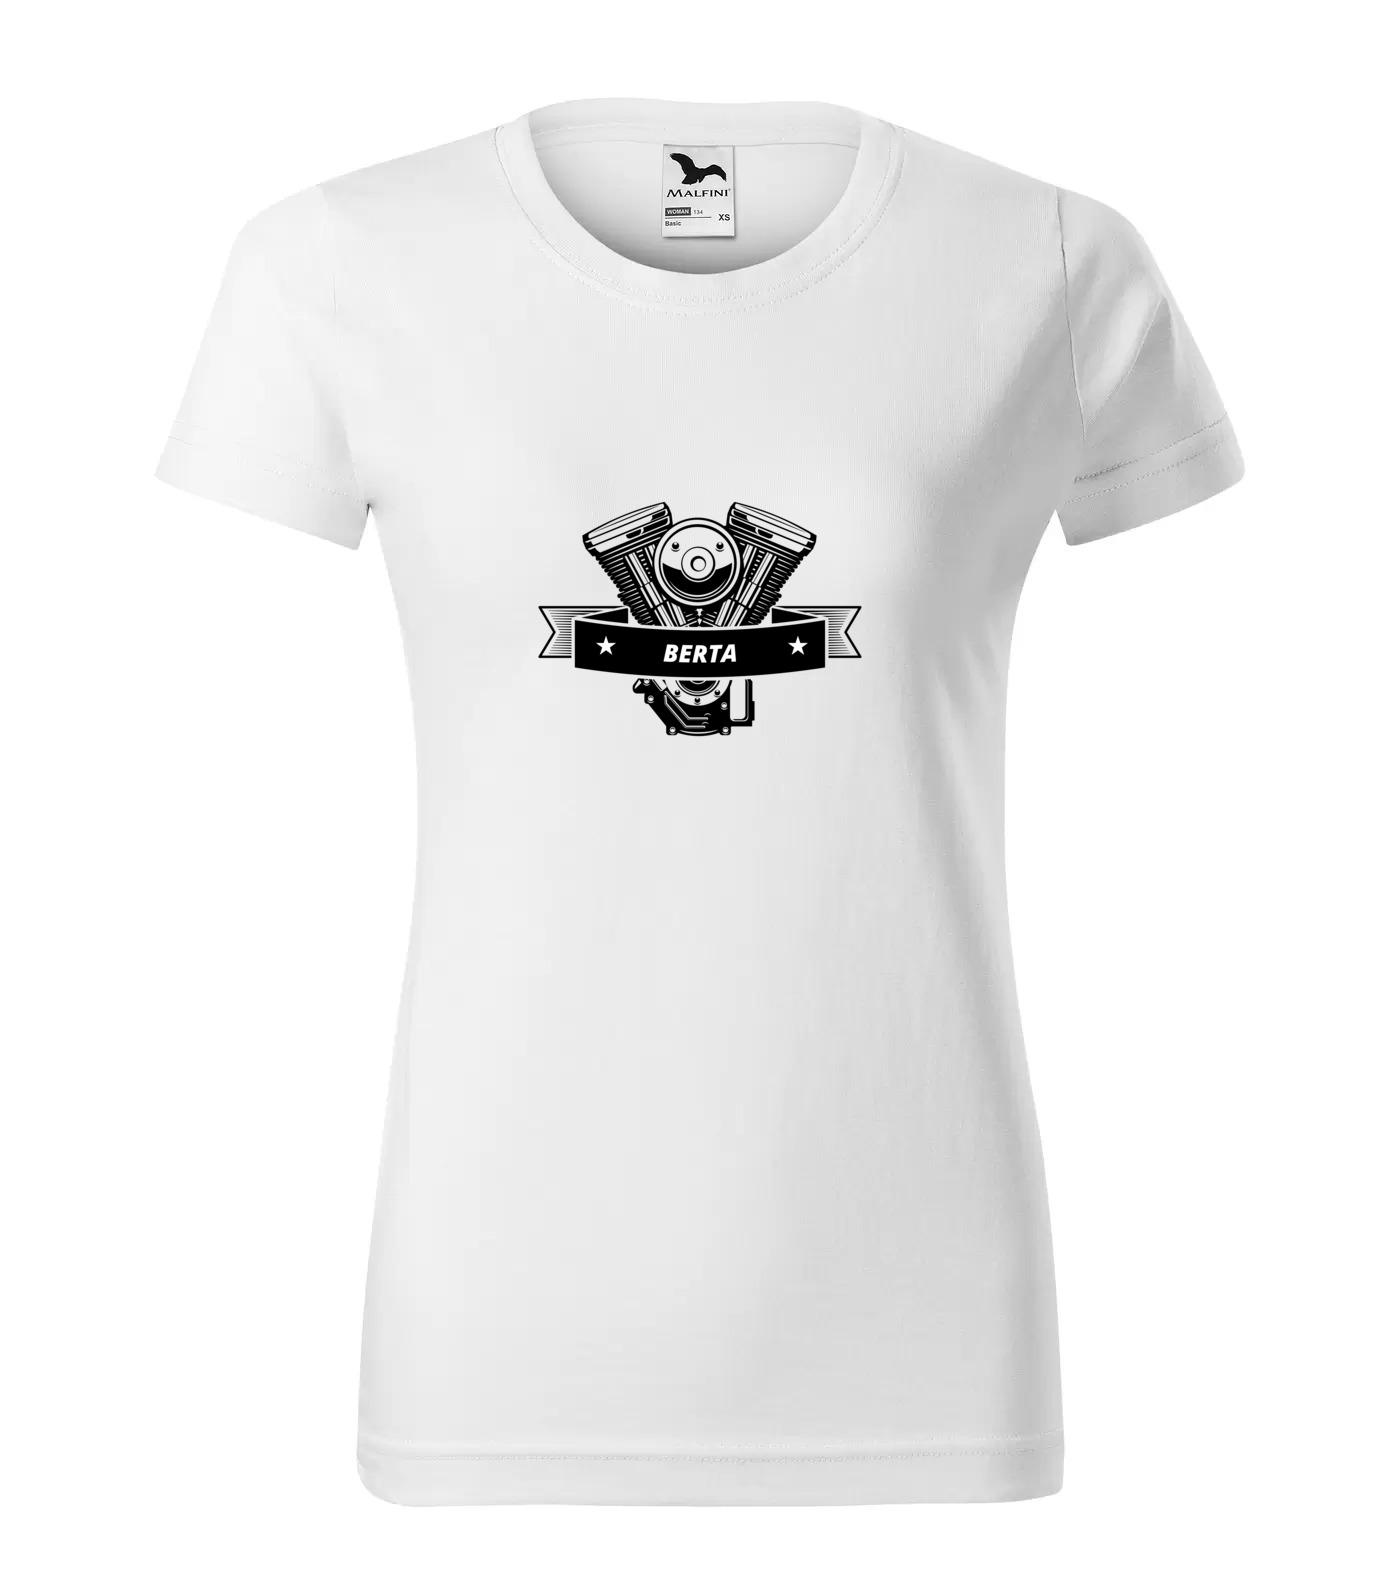 Tričko Motorkářka Berta